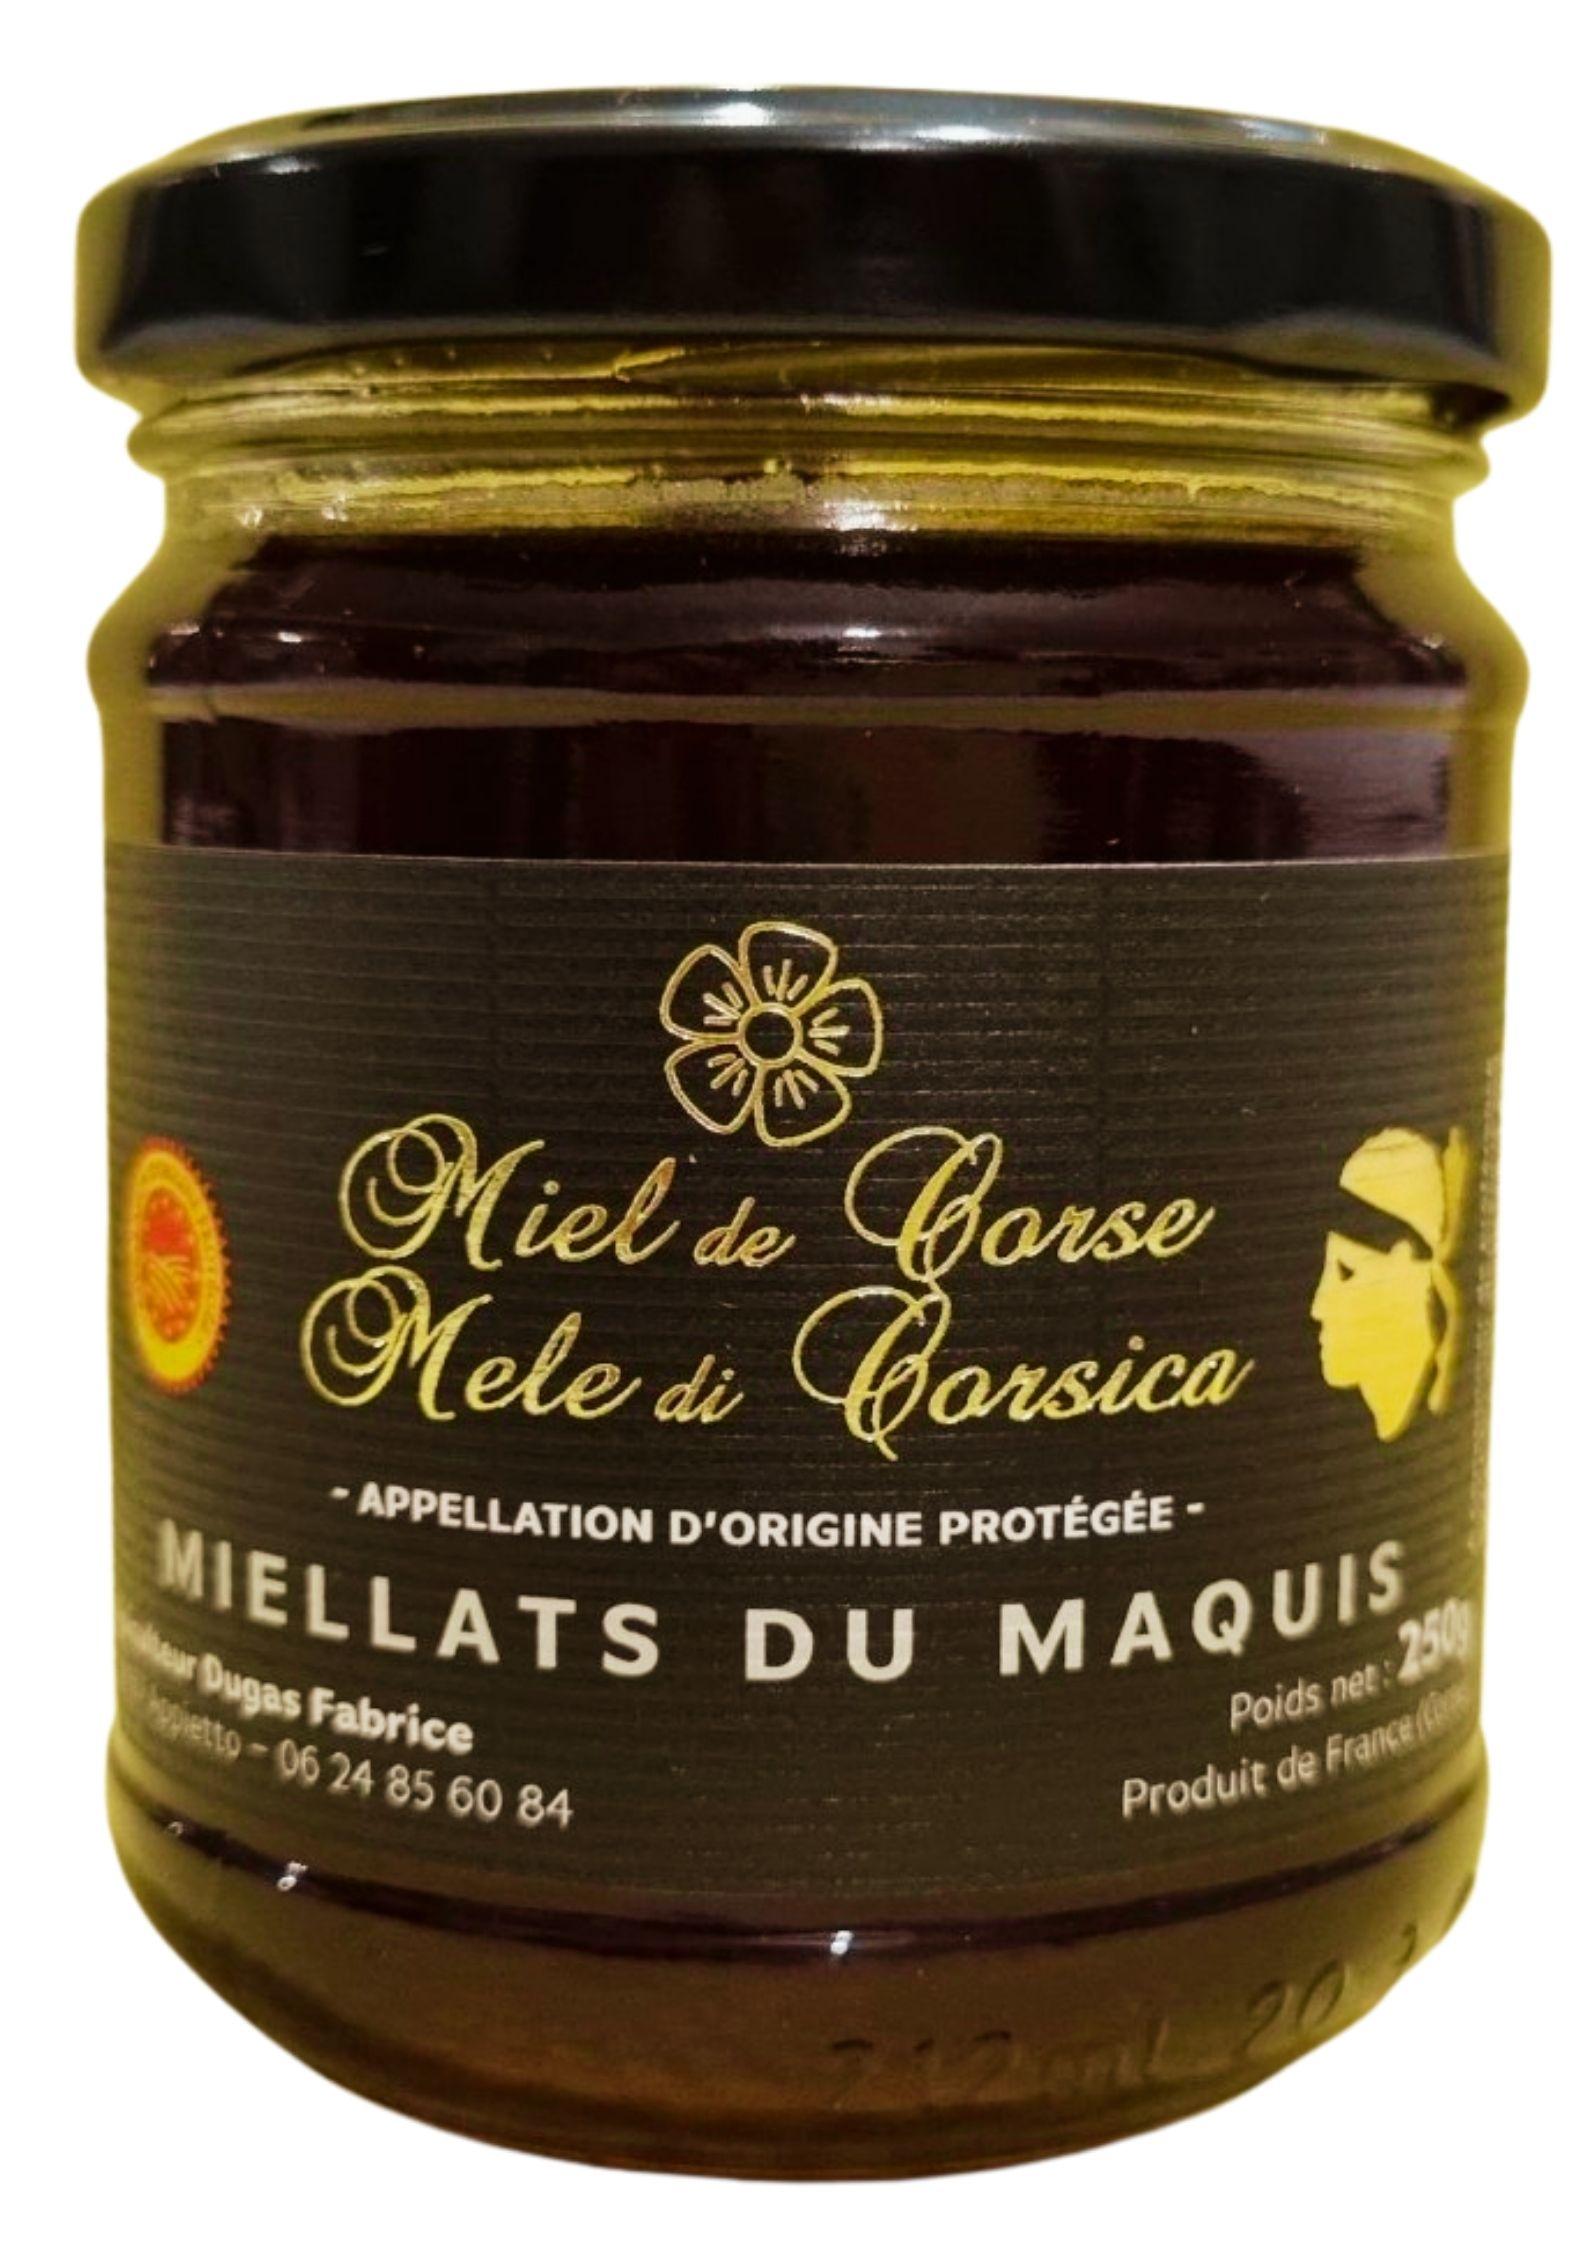 Miellats du Maquis miel de Corse AOP-AOC 250g - Fabrice Dugas